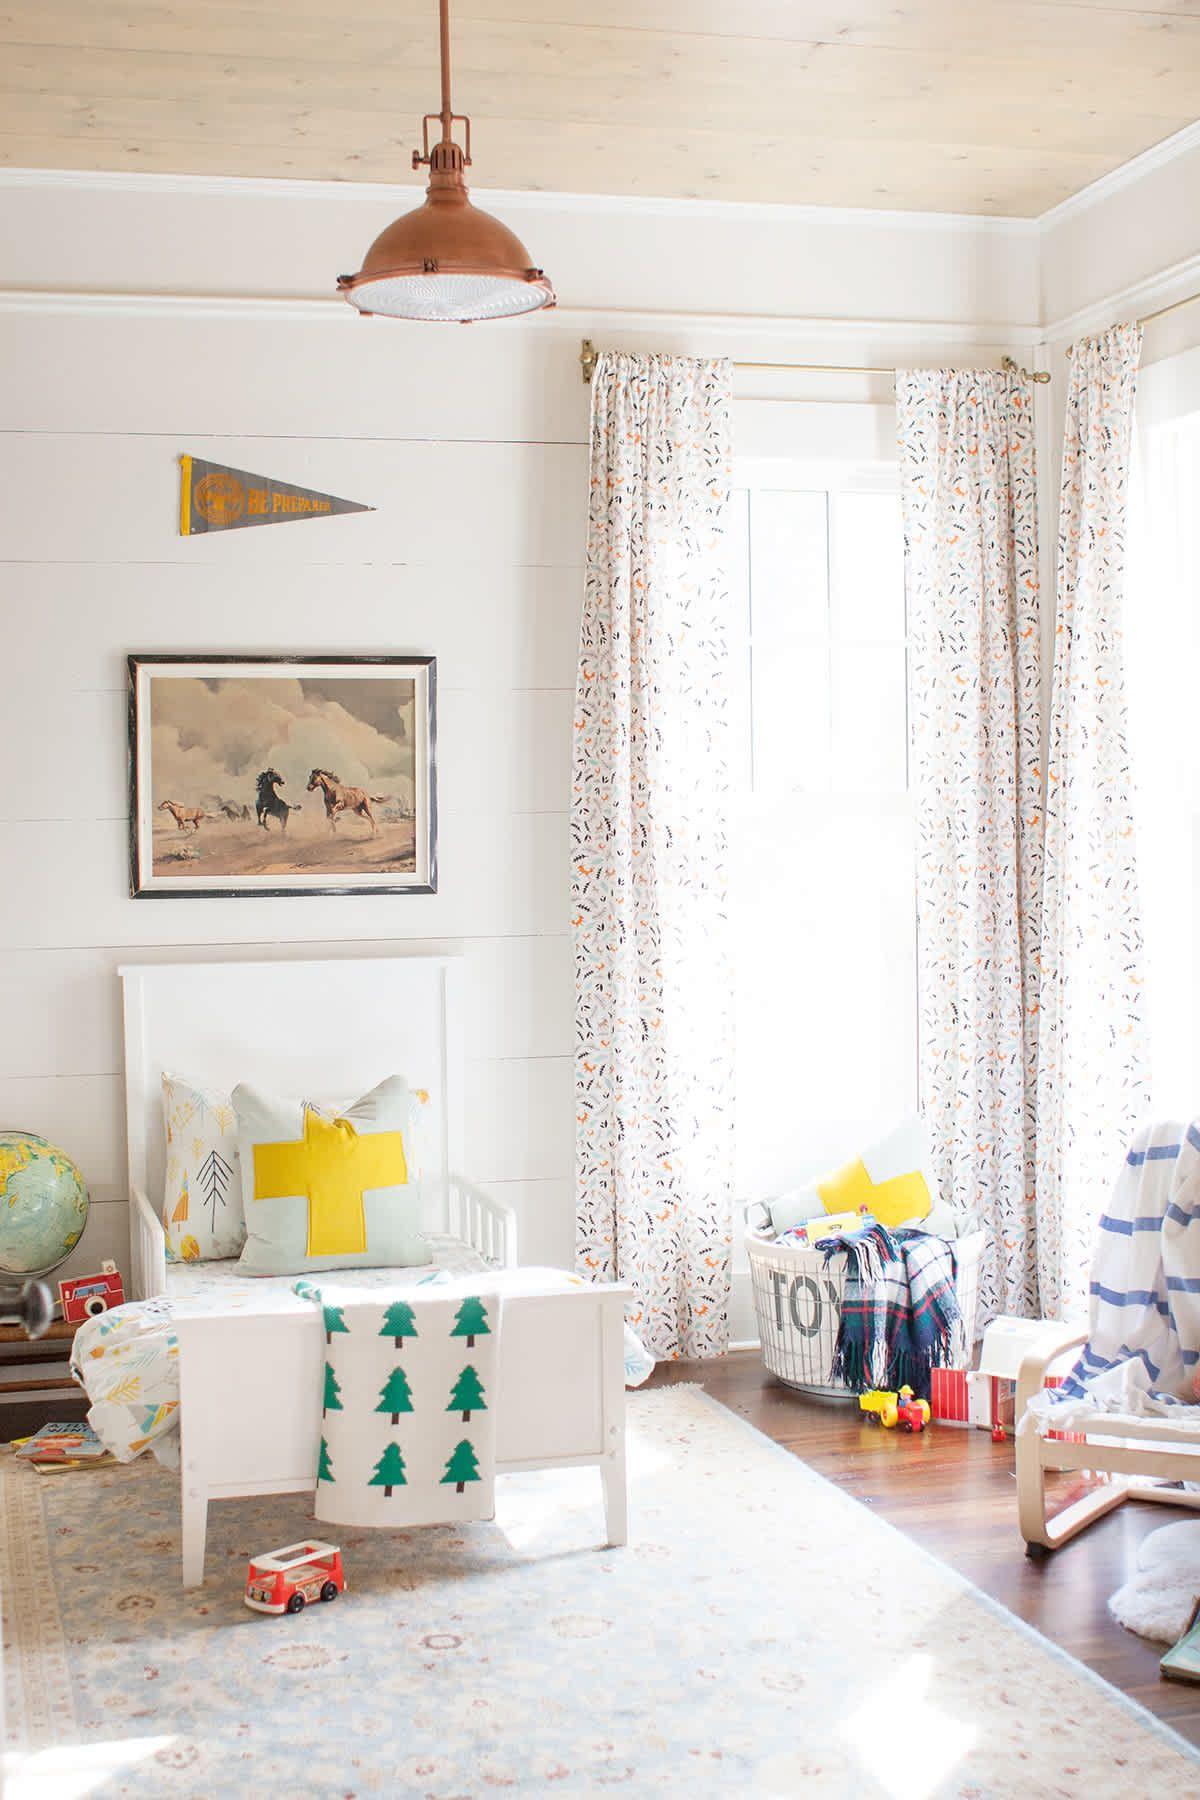 Cool Baby Boy Nursery Ideas: Bright And Rustic Little Boy Room